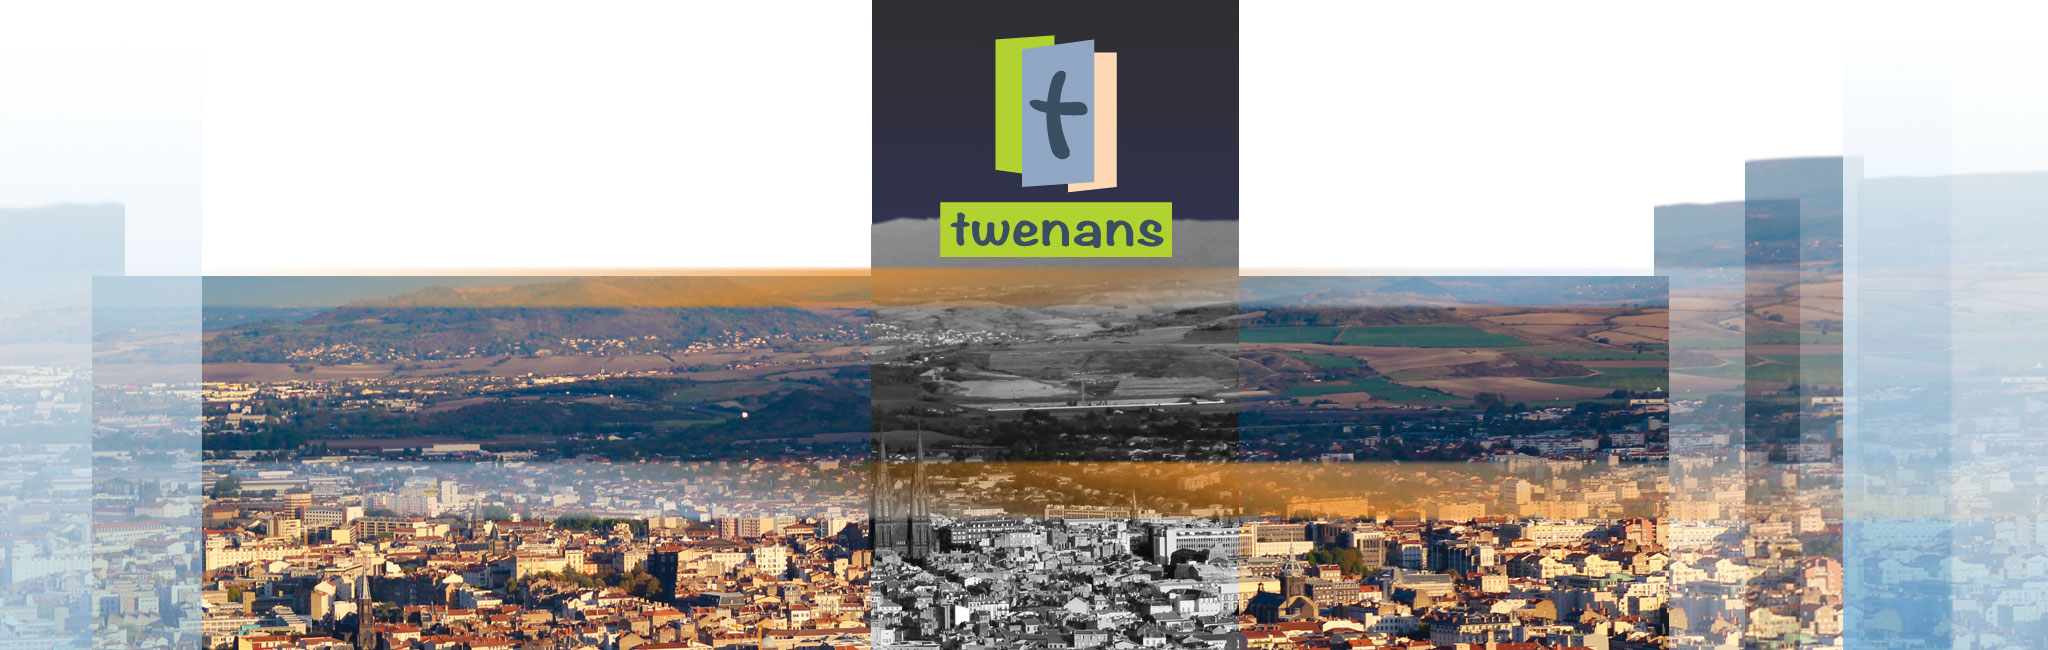 Twenans, Clermont-Ferrand